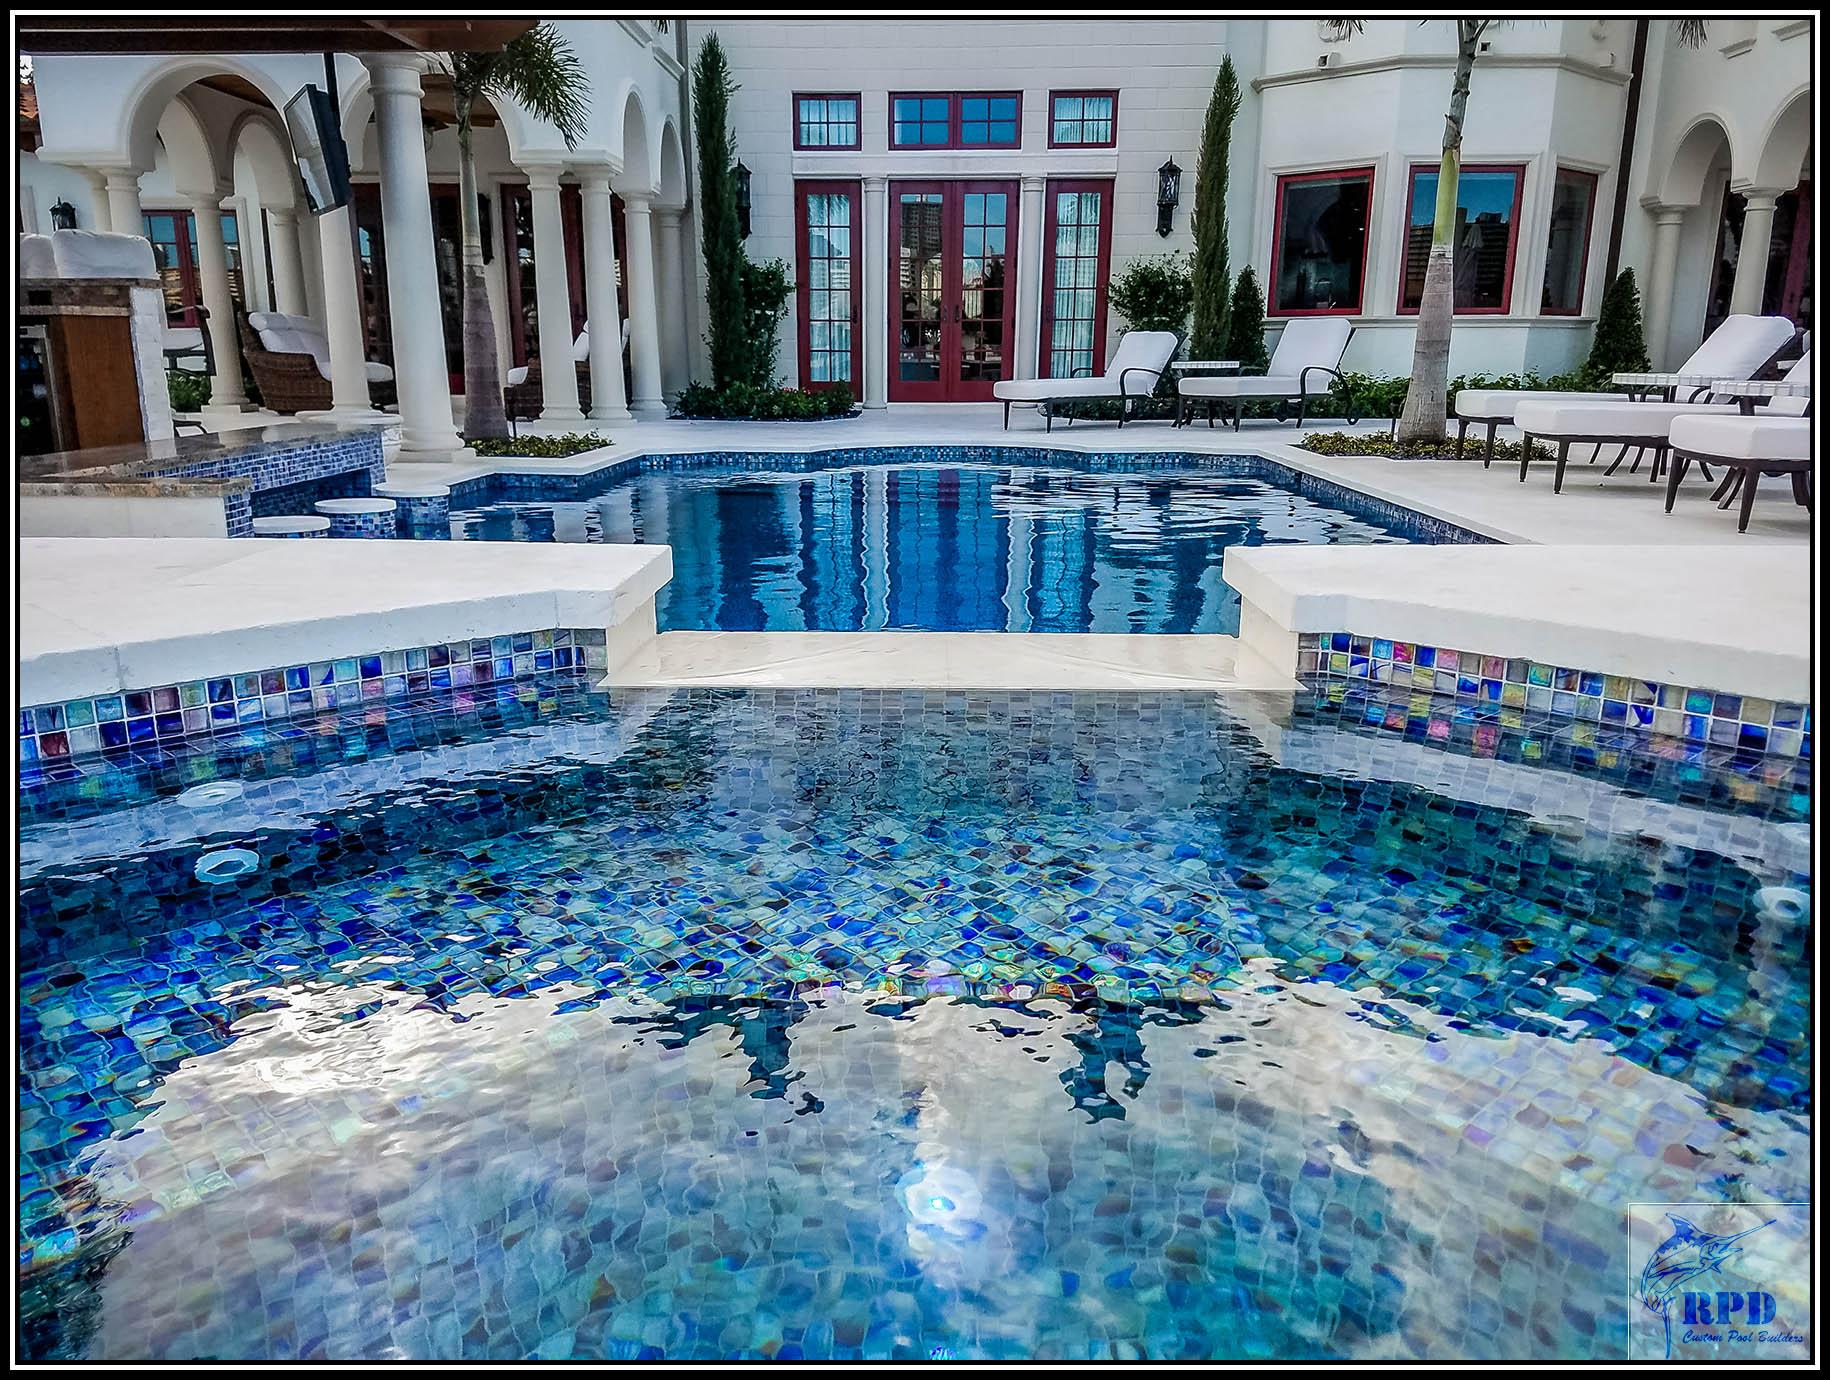 ©RPD-Fernicola-Remodel-Fort-Lauderdale-Apr2017-KTO0023.jpg